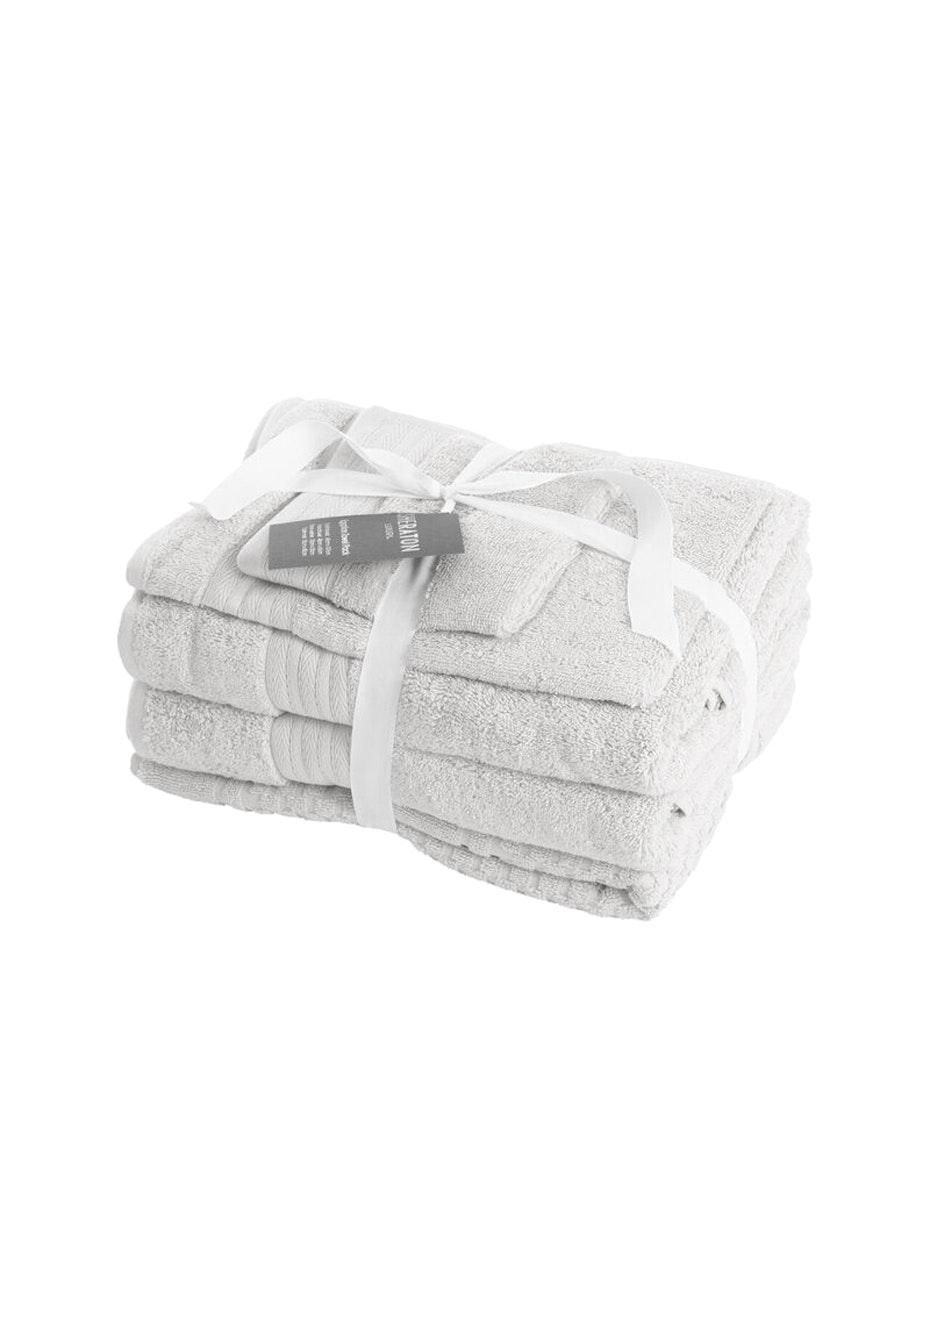 Sheraton Egptian 5 Piece Towel Pack - Colour Powder Blue